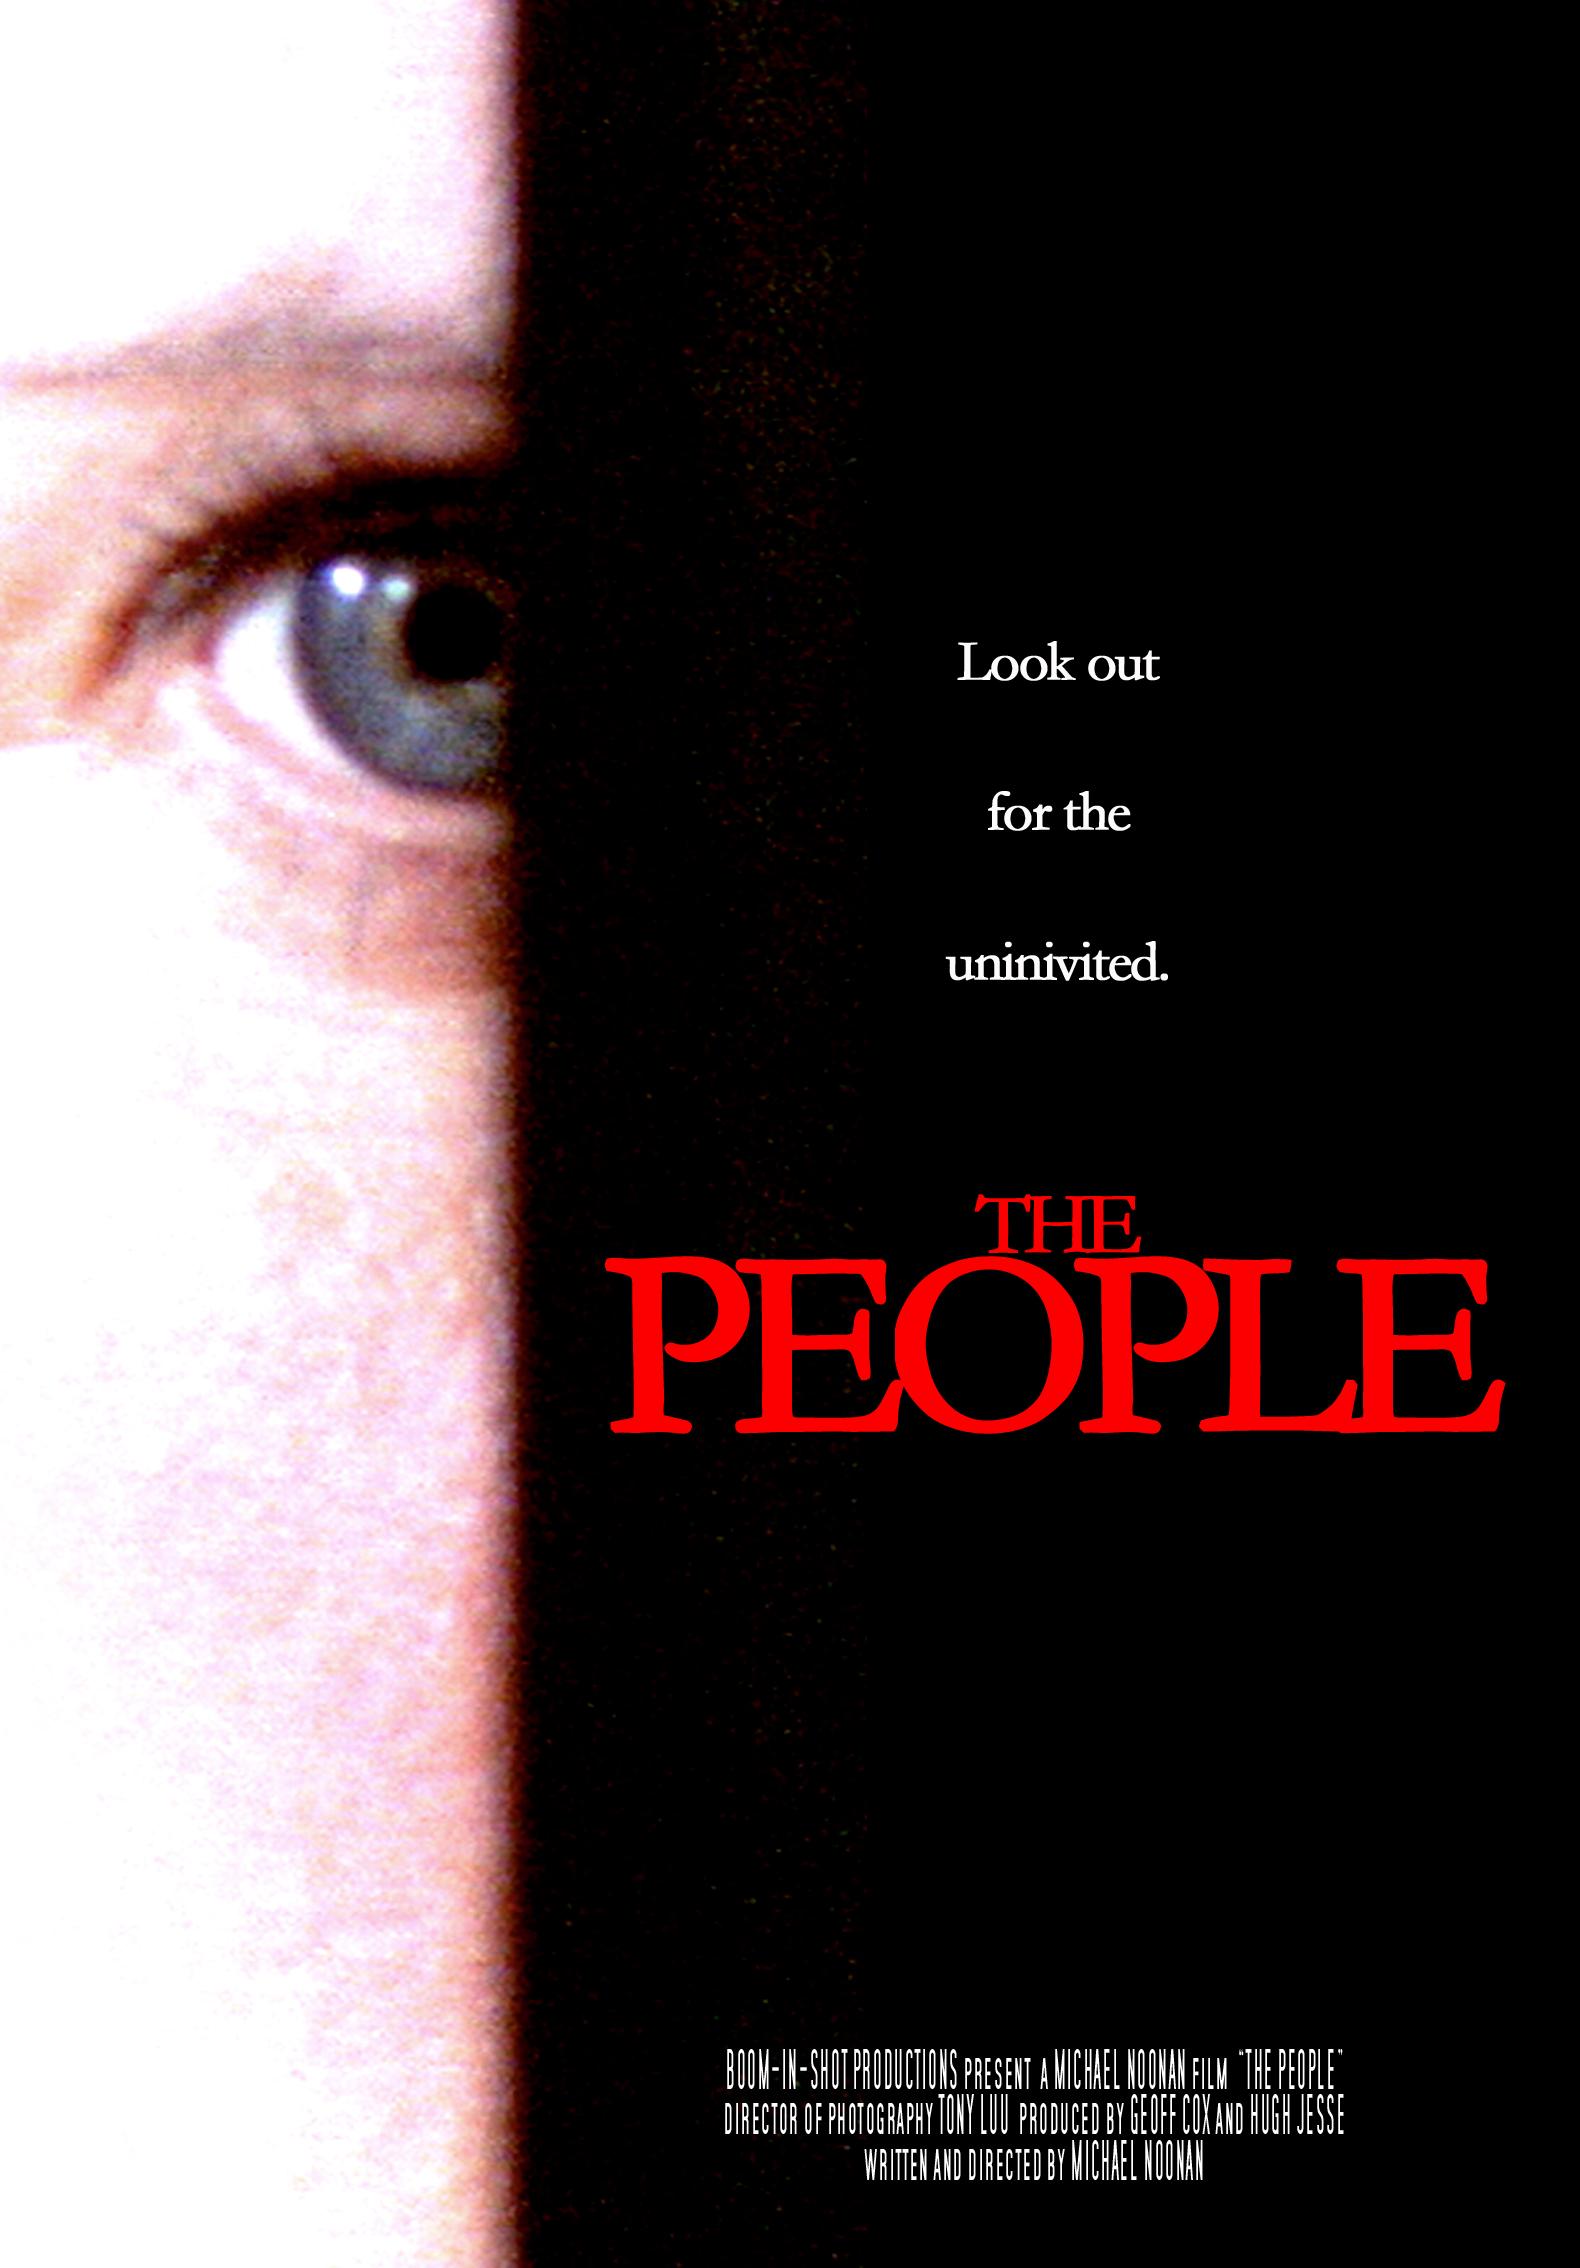 THE PEOPLE NEW.jpg